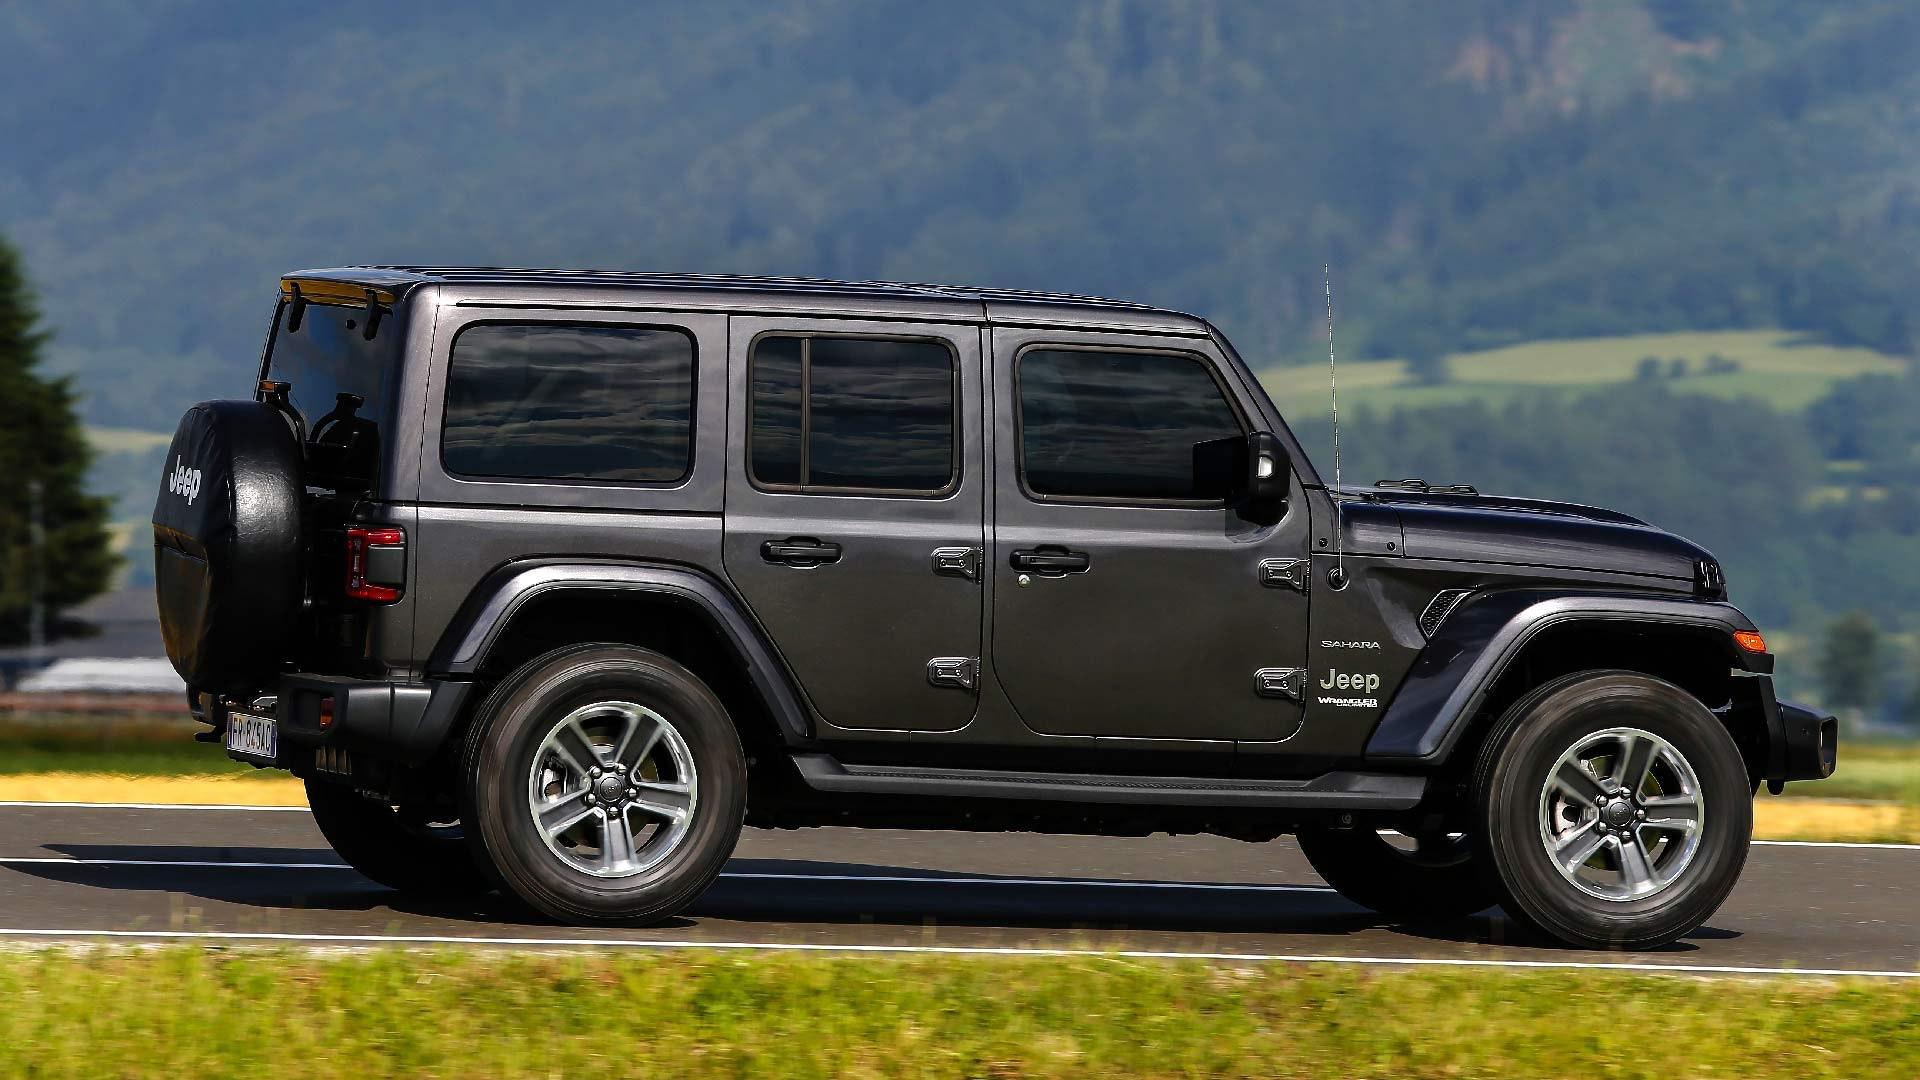 Jeep Wrangler sort